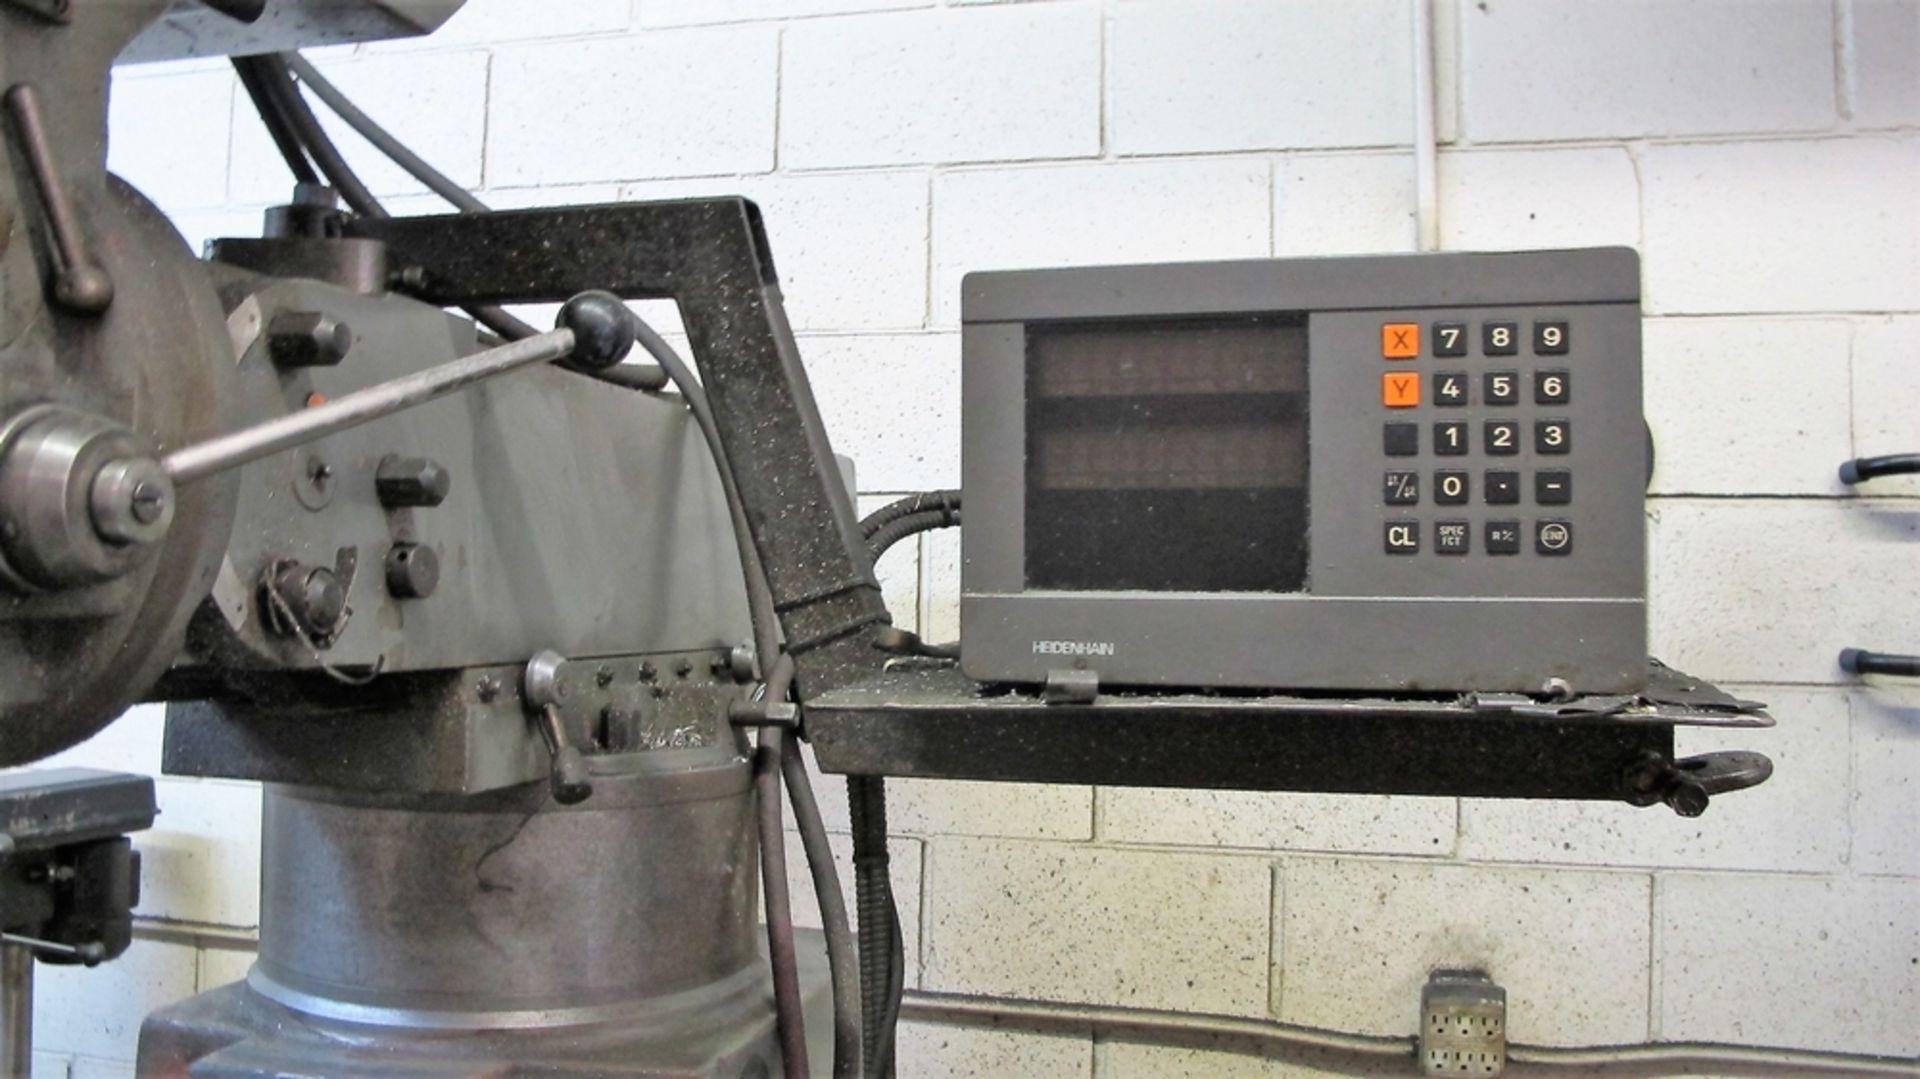 Lot 30 - TOS-KARIM VERTICAL MILLING MACHINE, 1-1/2 HP, MODEL FNK25, 56-4500 RPM, HEIDENHAIN 2 AXIS DRO, 11-